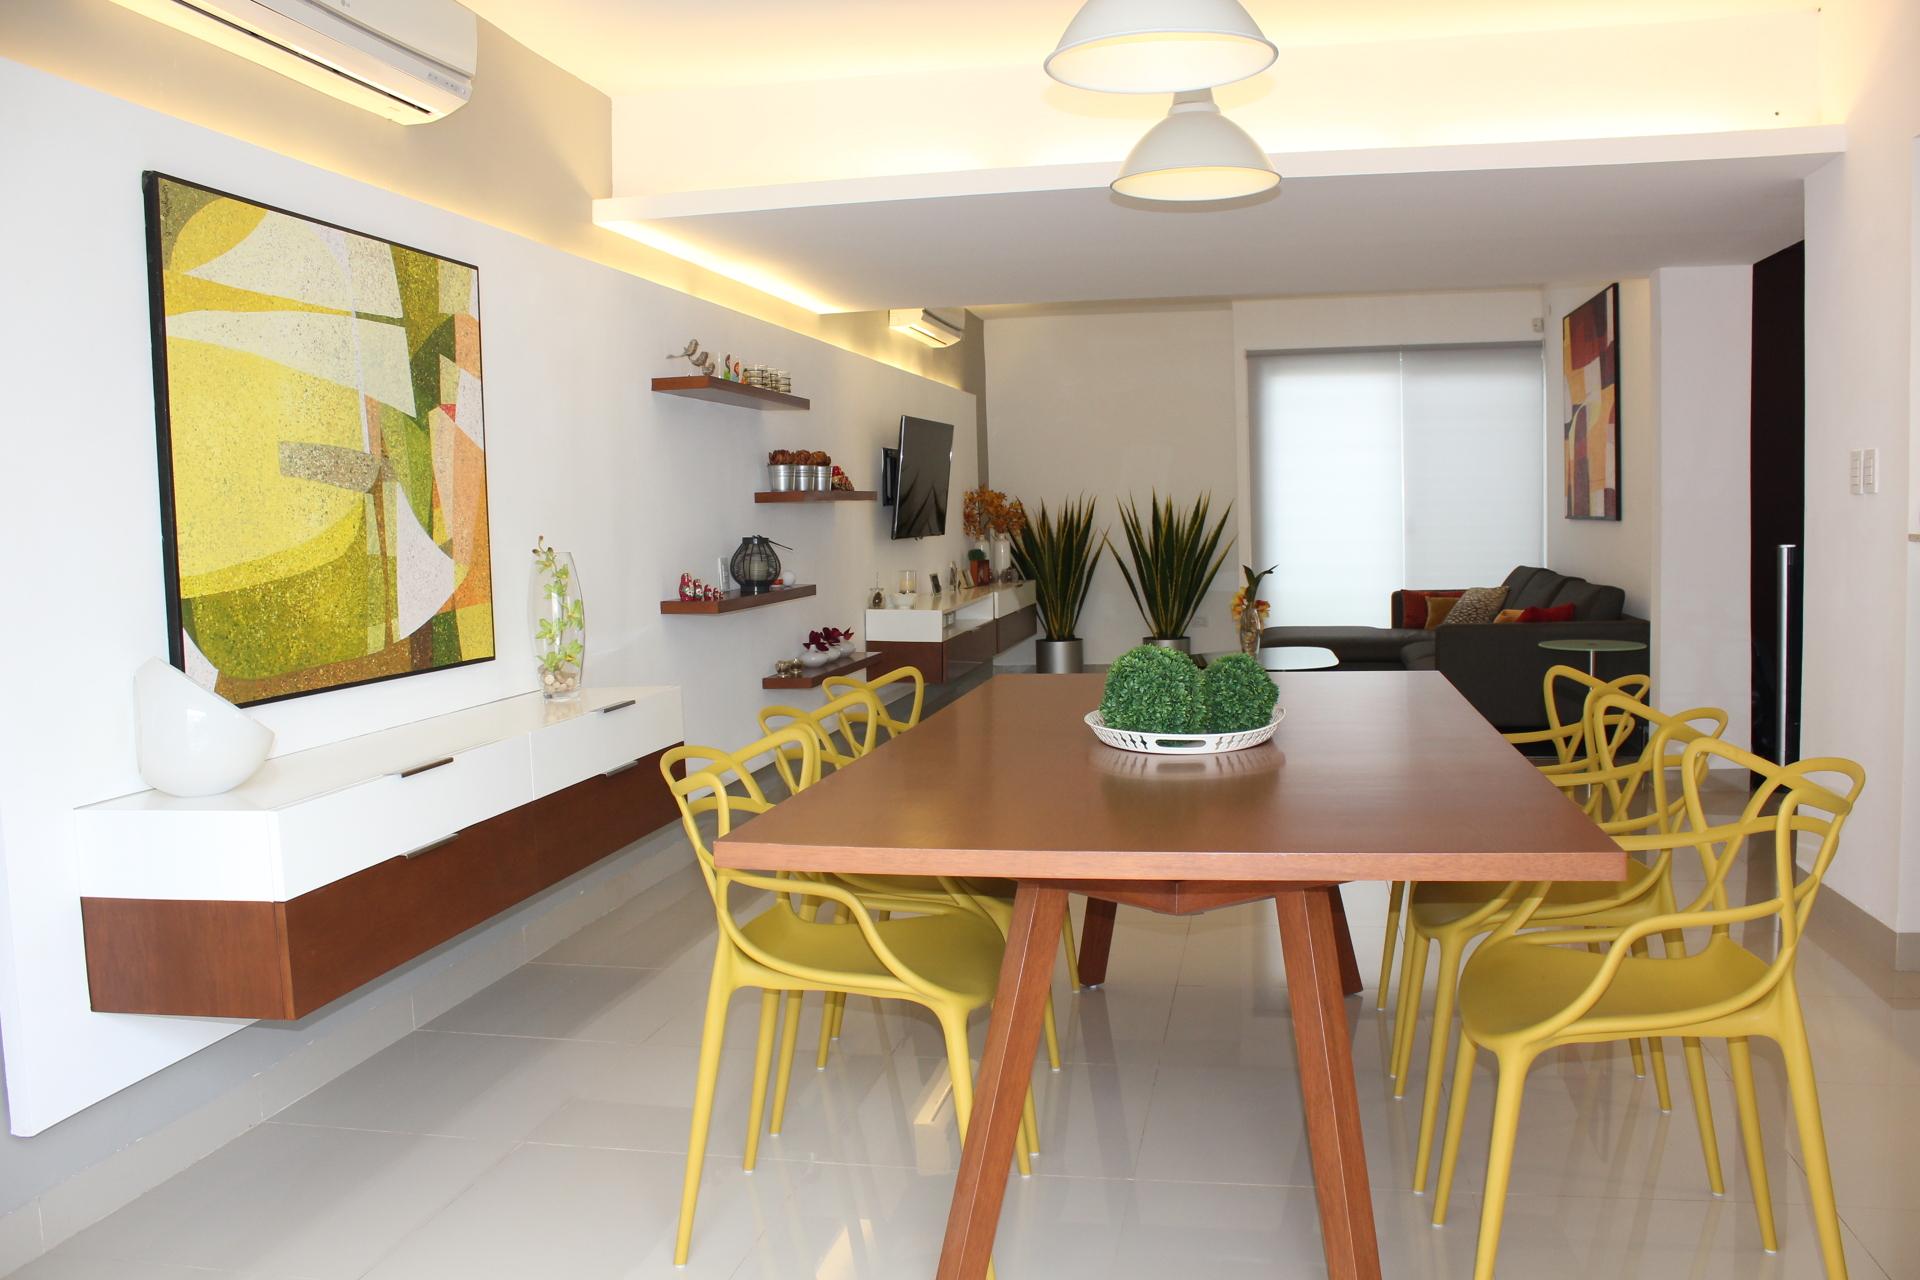 Dise o interior sala comedor for Interiores sala comedor